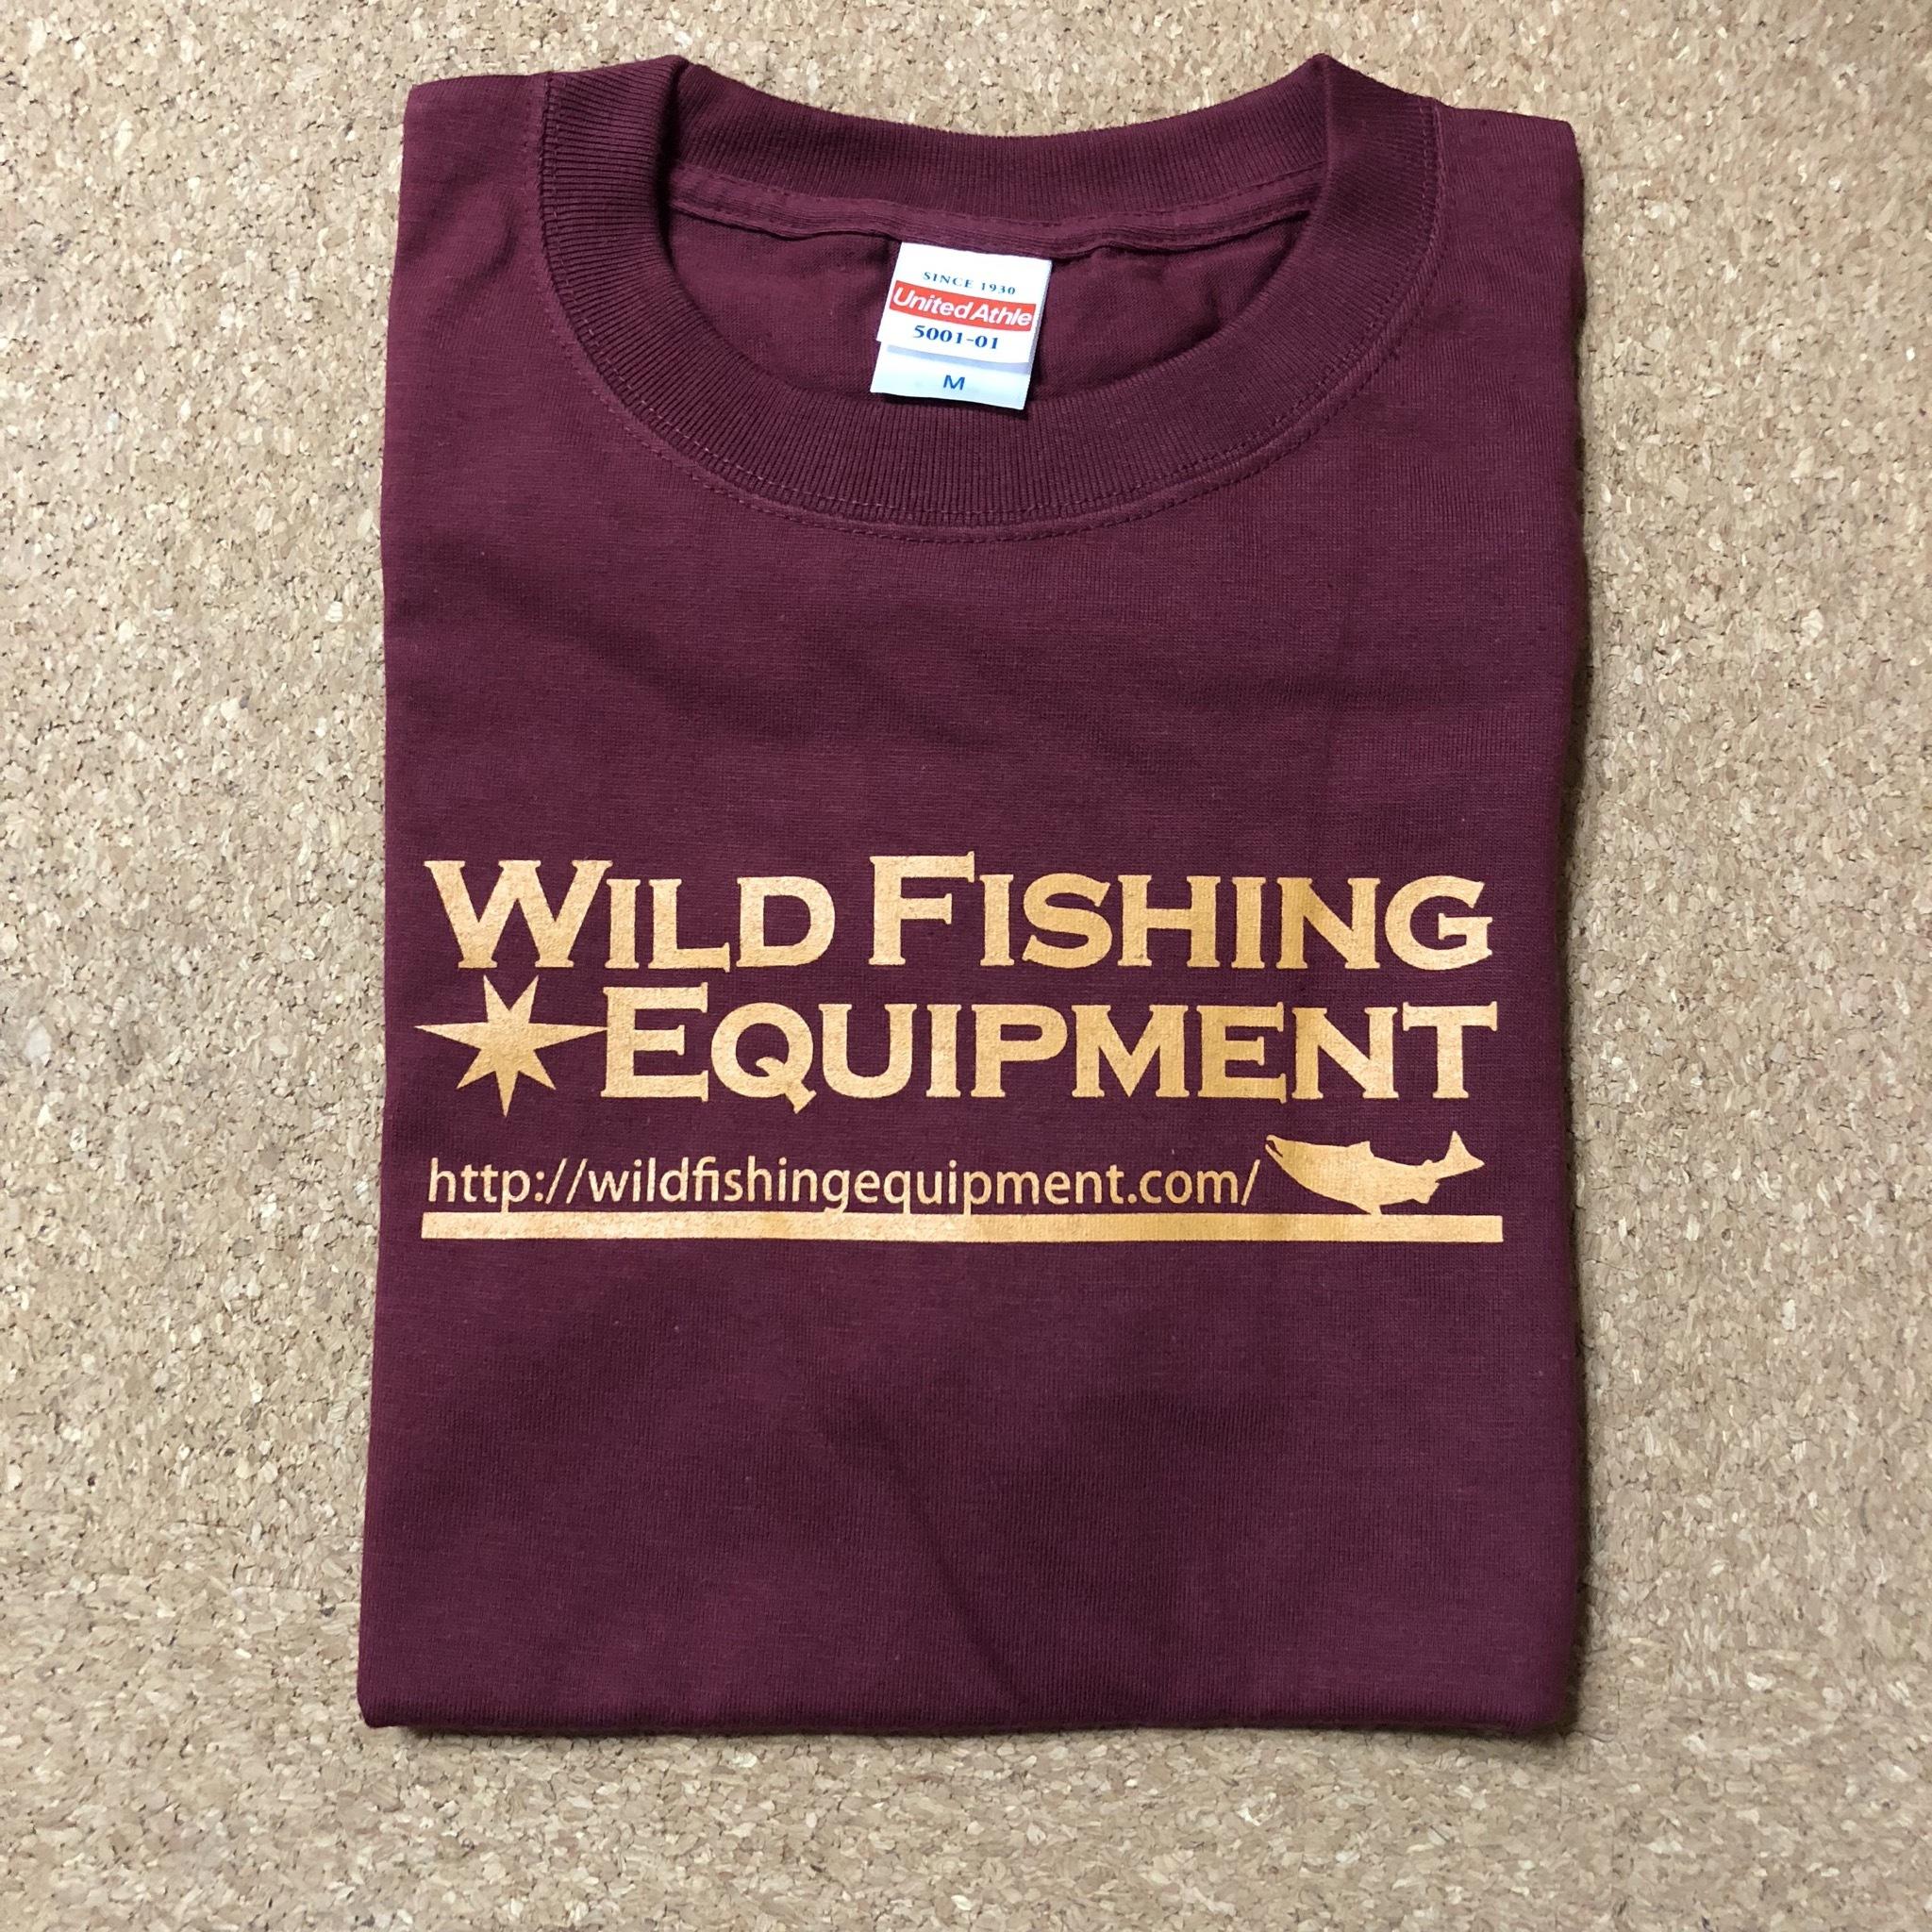 WildfishingequipmentオリジナルTシャツ【バーガンディ】